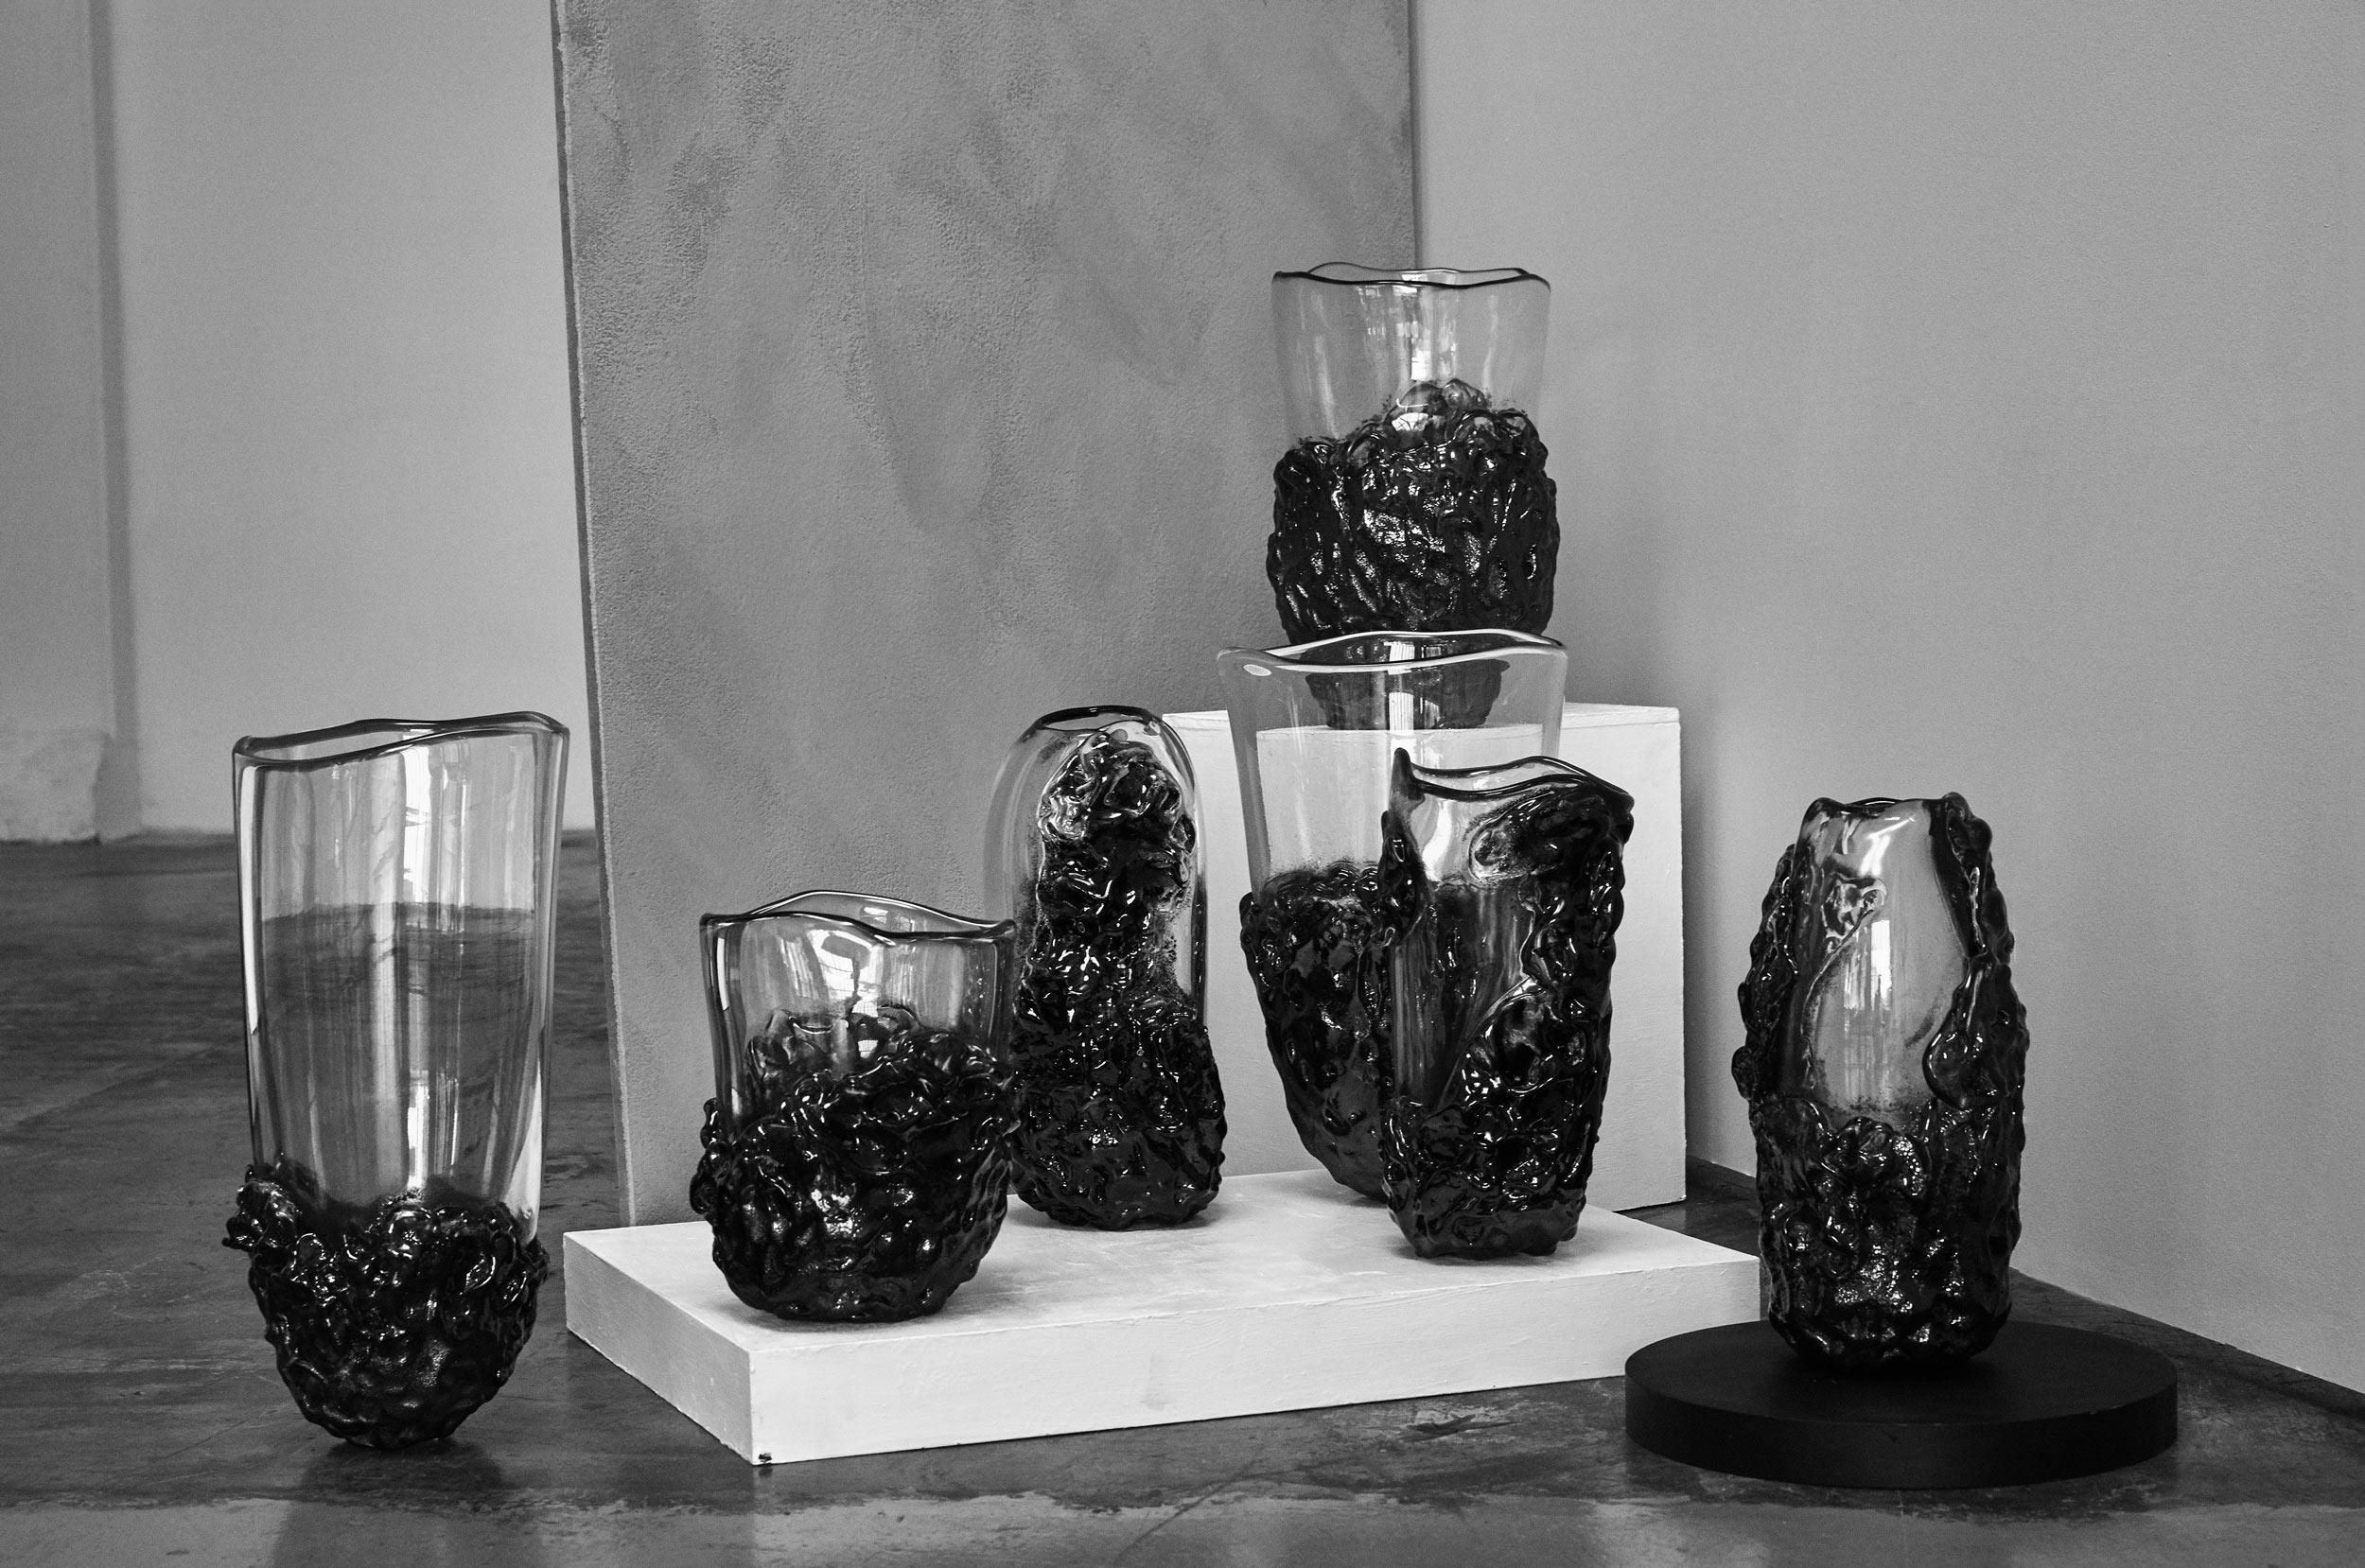 pentimento rhizome - studio Martin Bergström / Skarp creative